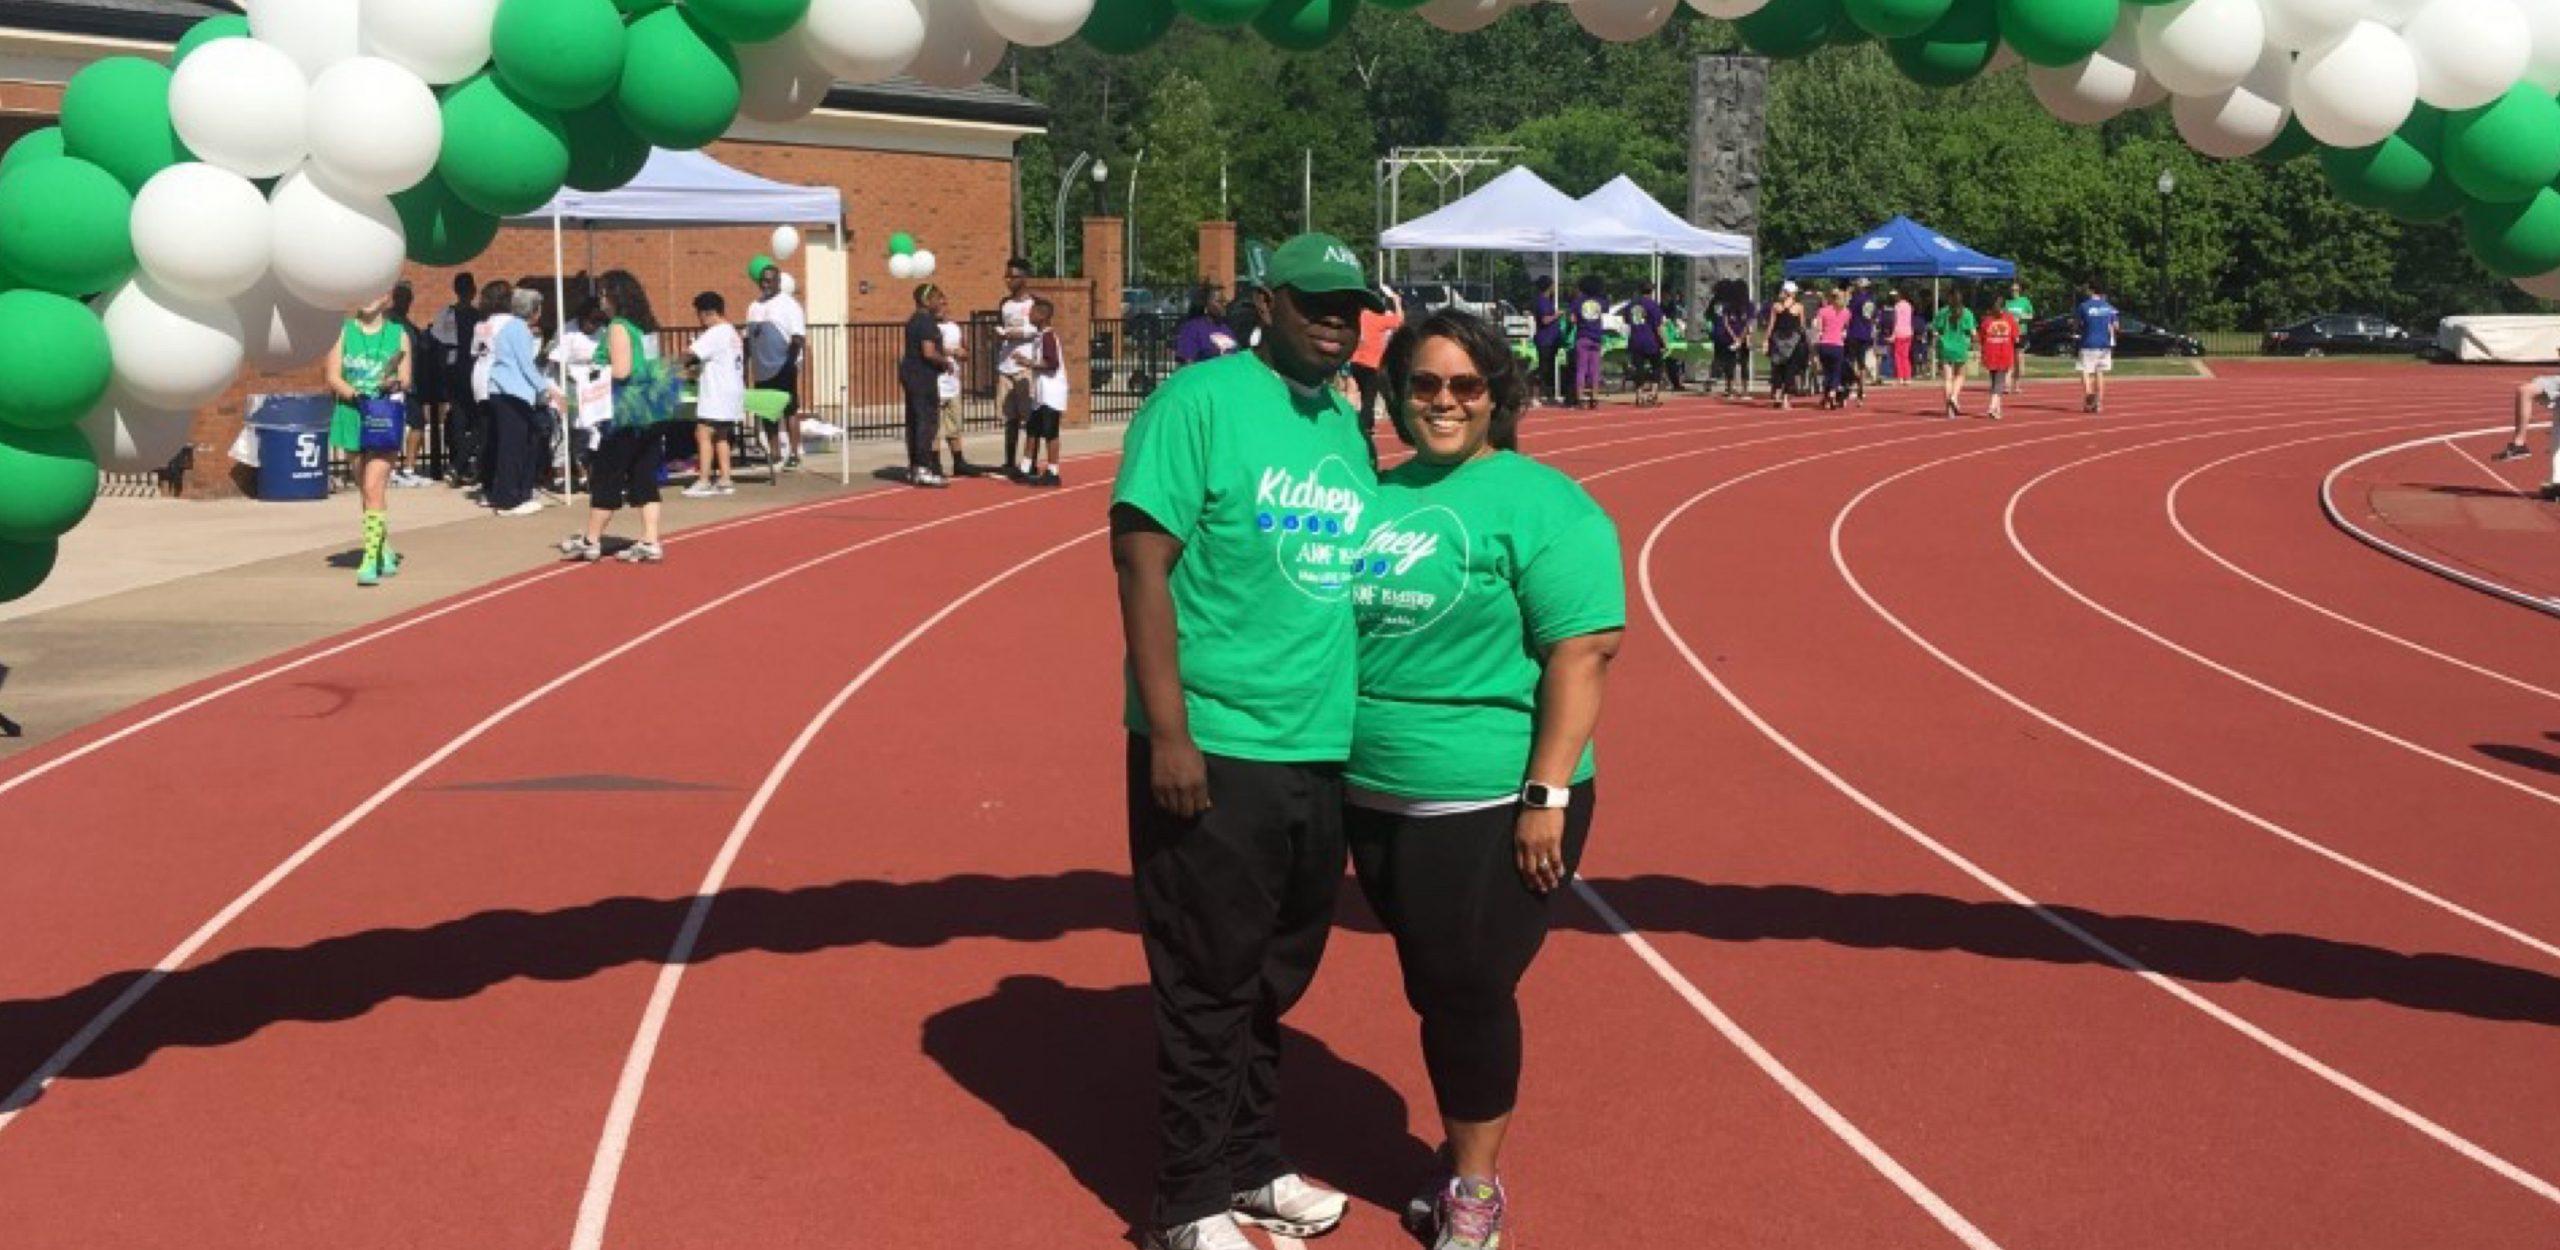 Patient Dedication - A Kidney Disease Success Story